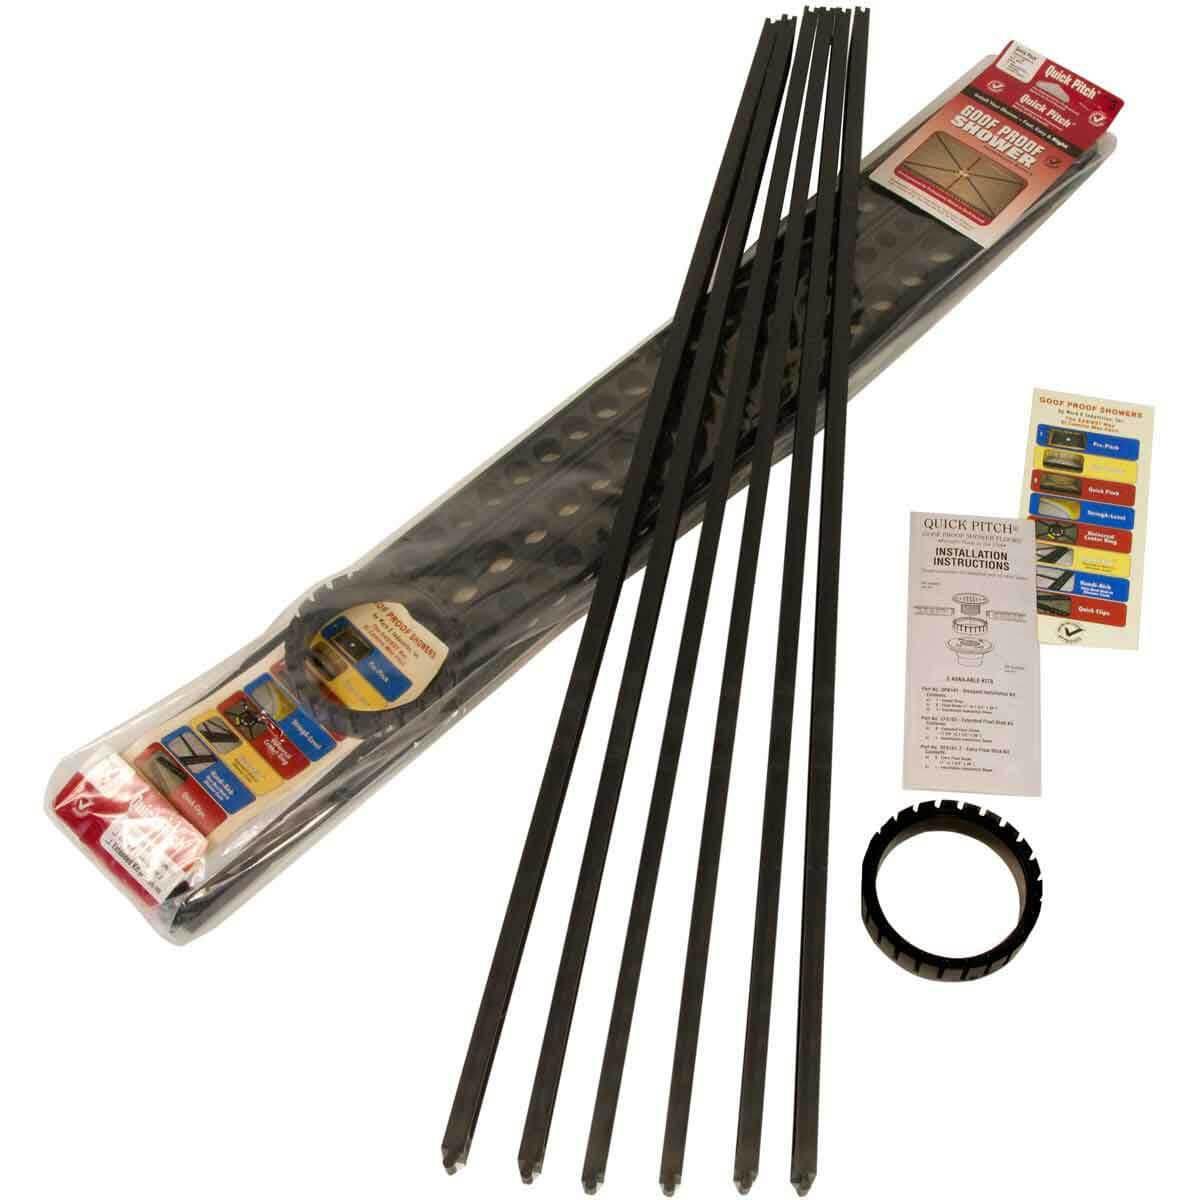 QPK-101 Standard Kit Quick-Pitch Shower Floor Drainage Kit